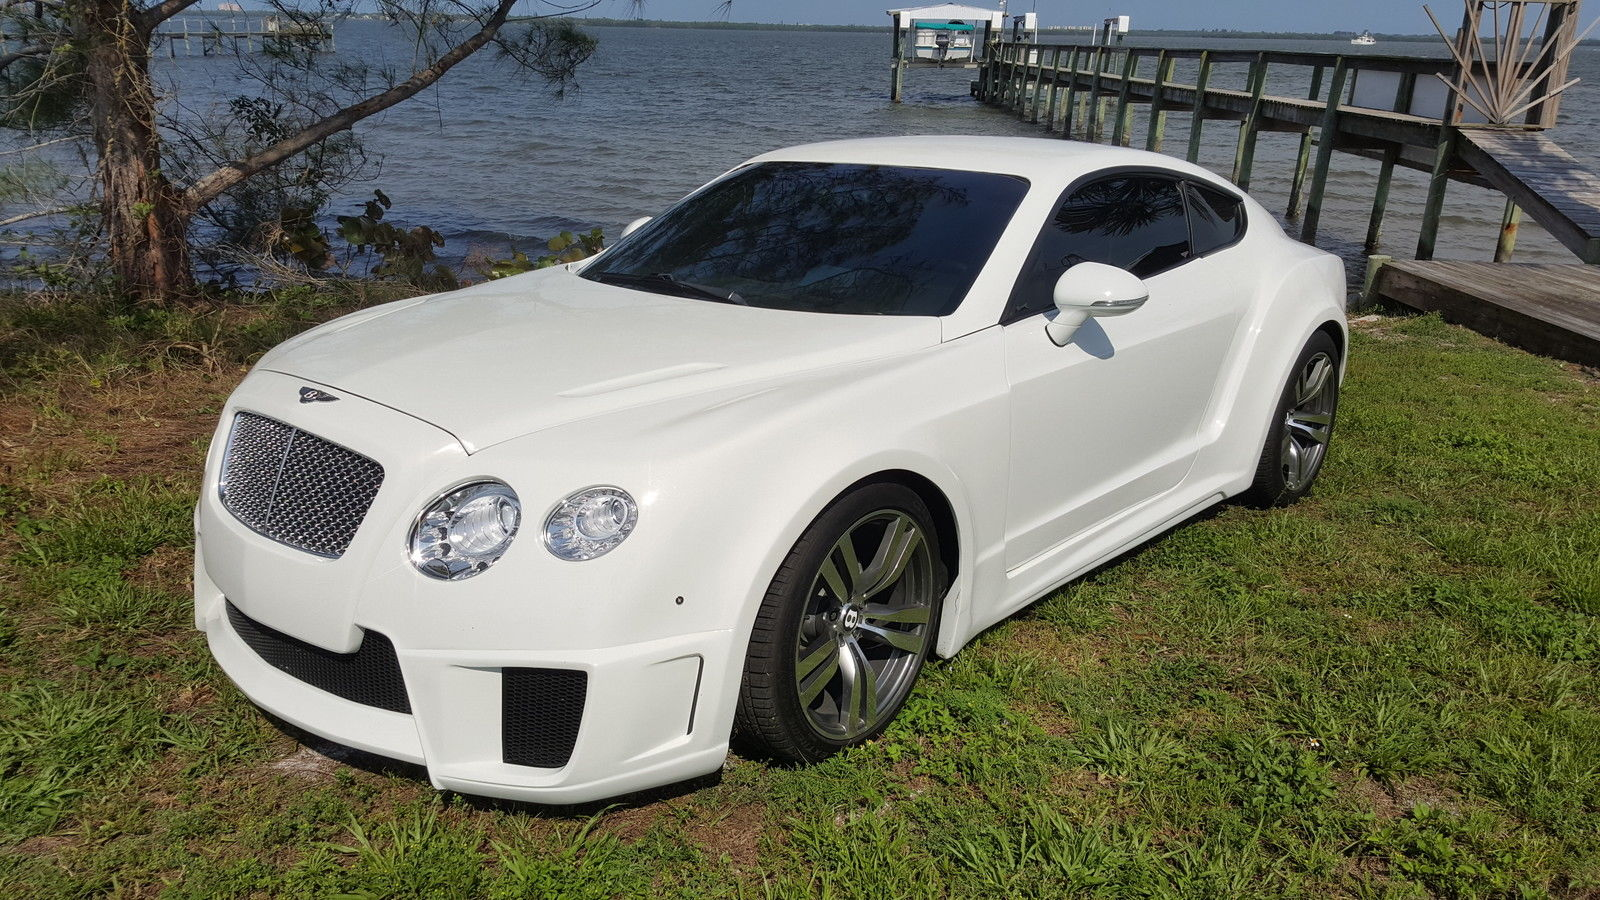 Bentley Cars Prices